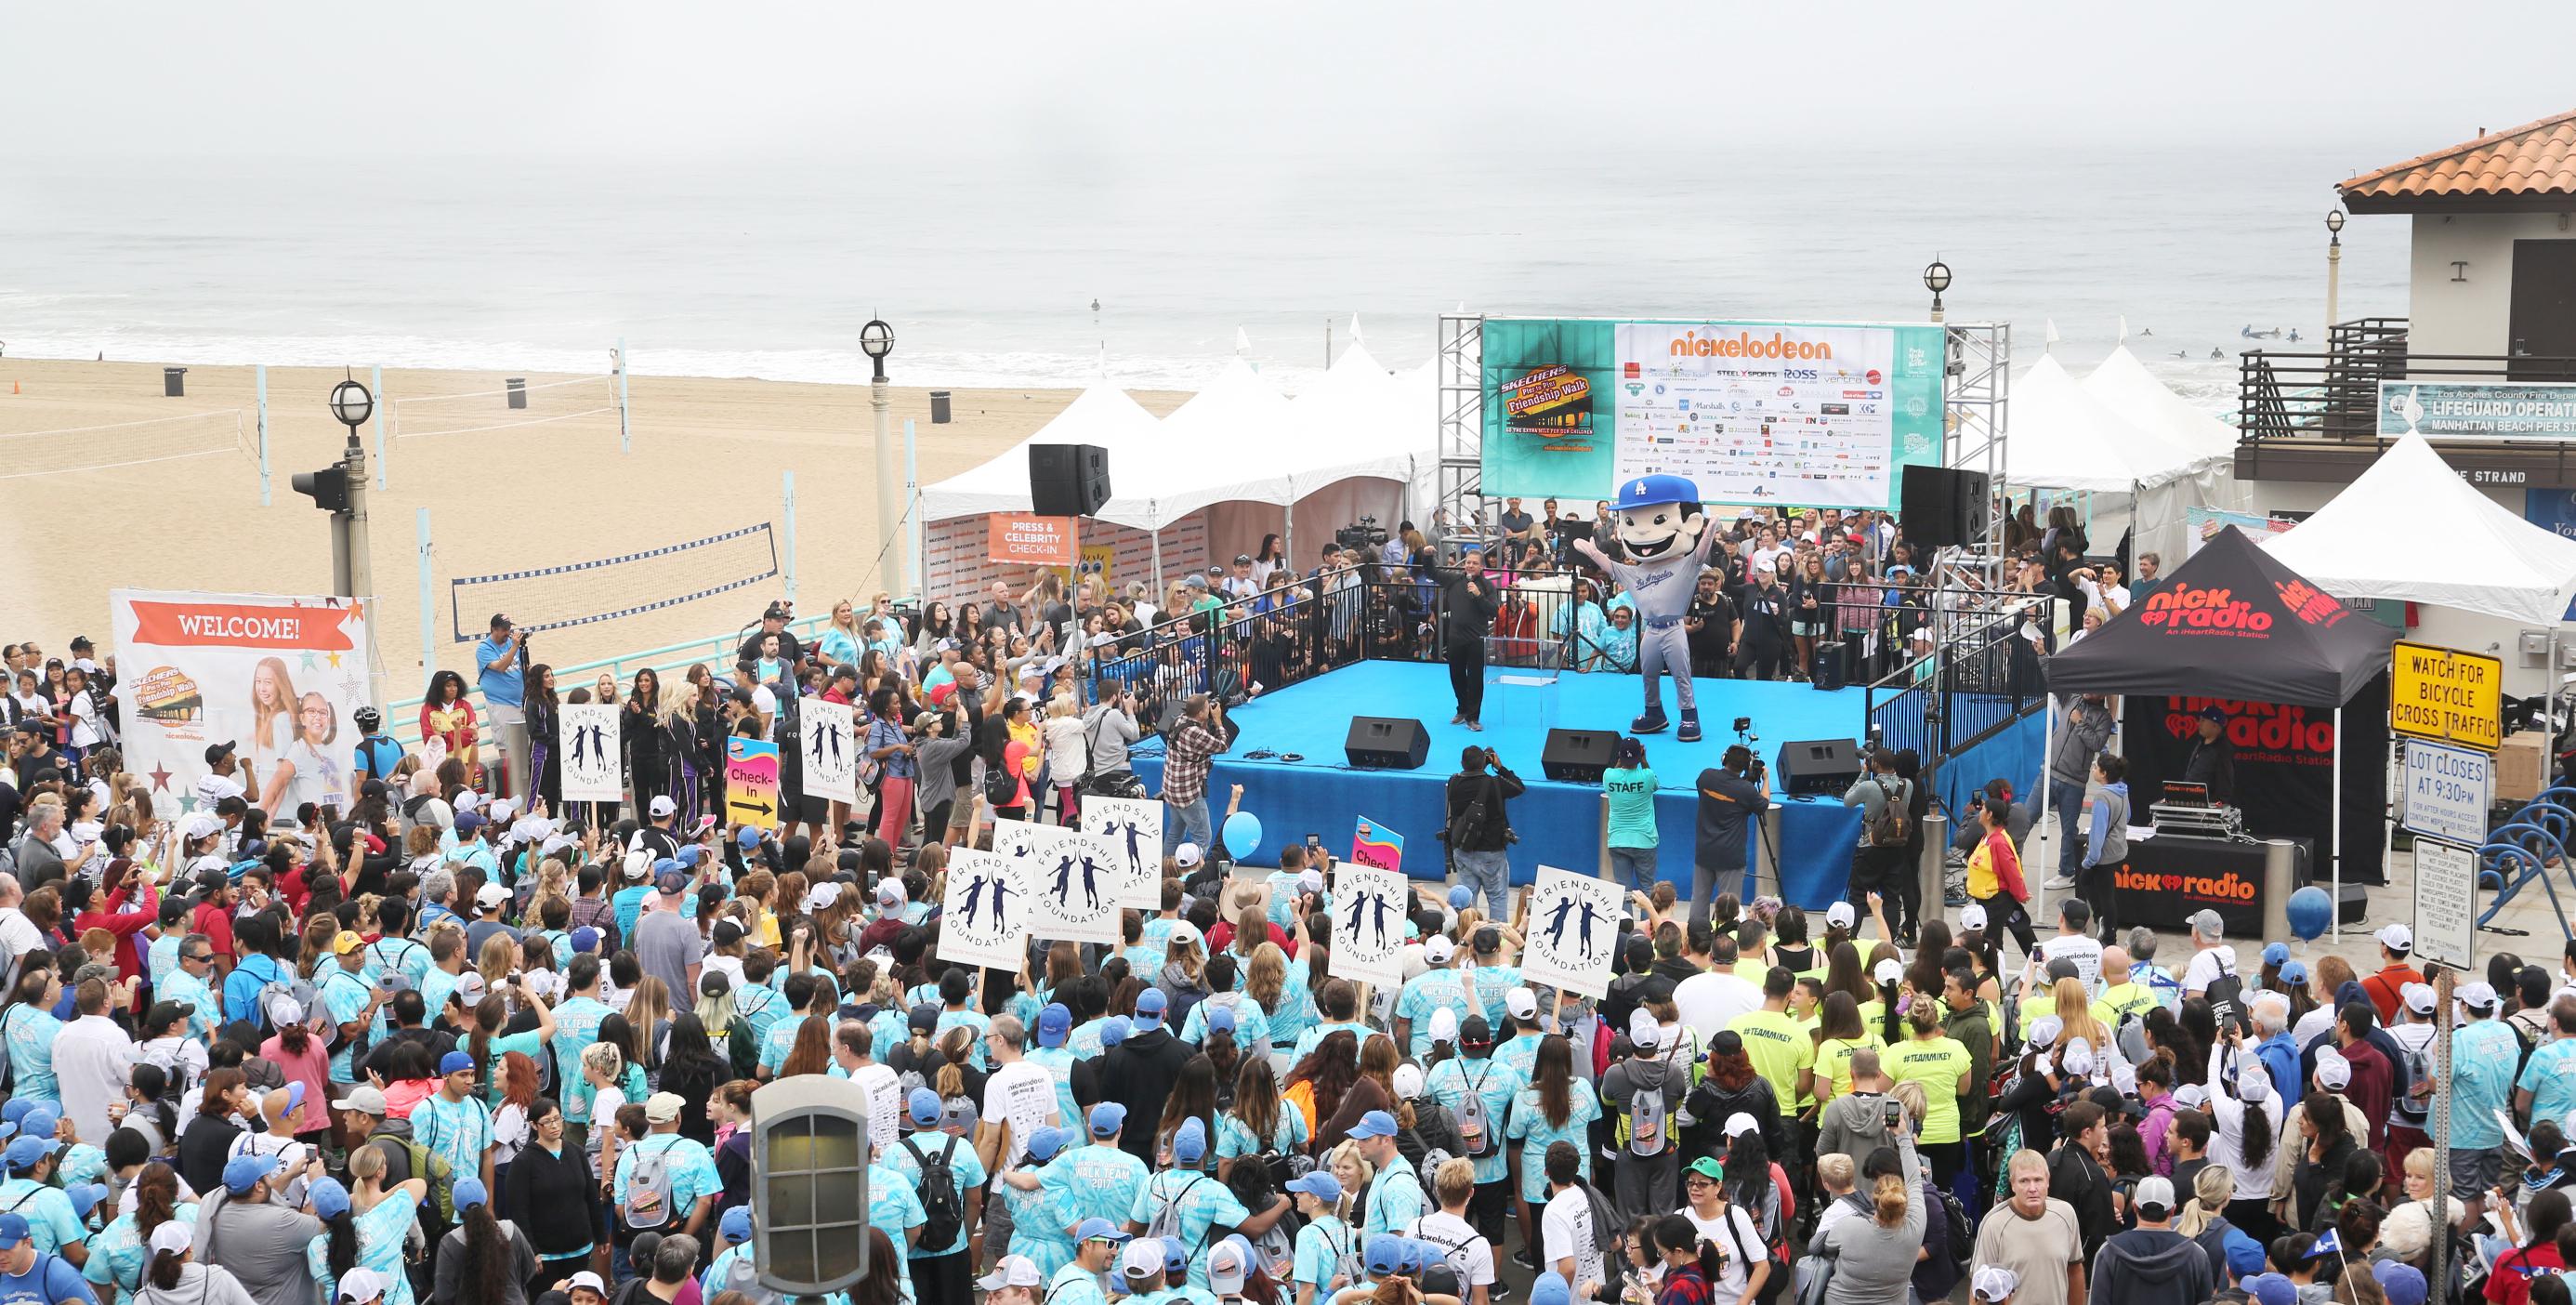 Skechers Celebrates 10th Pier to Pier Friendship Walk with